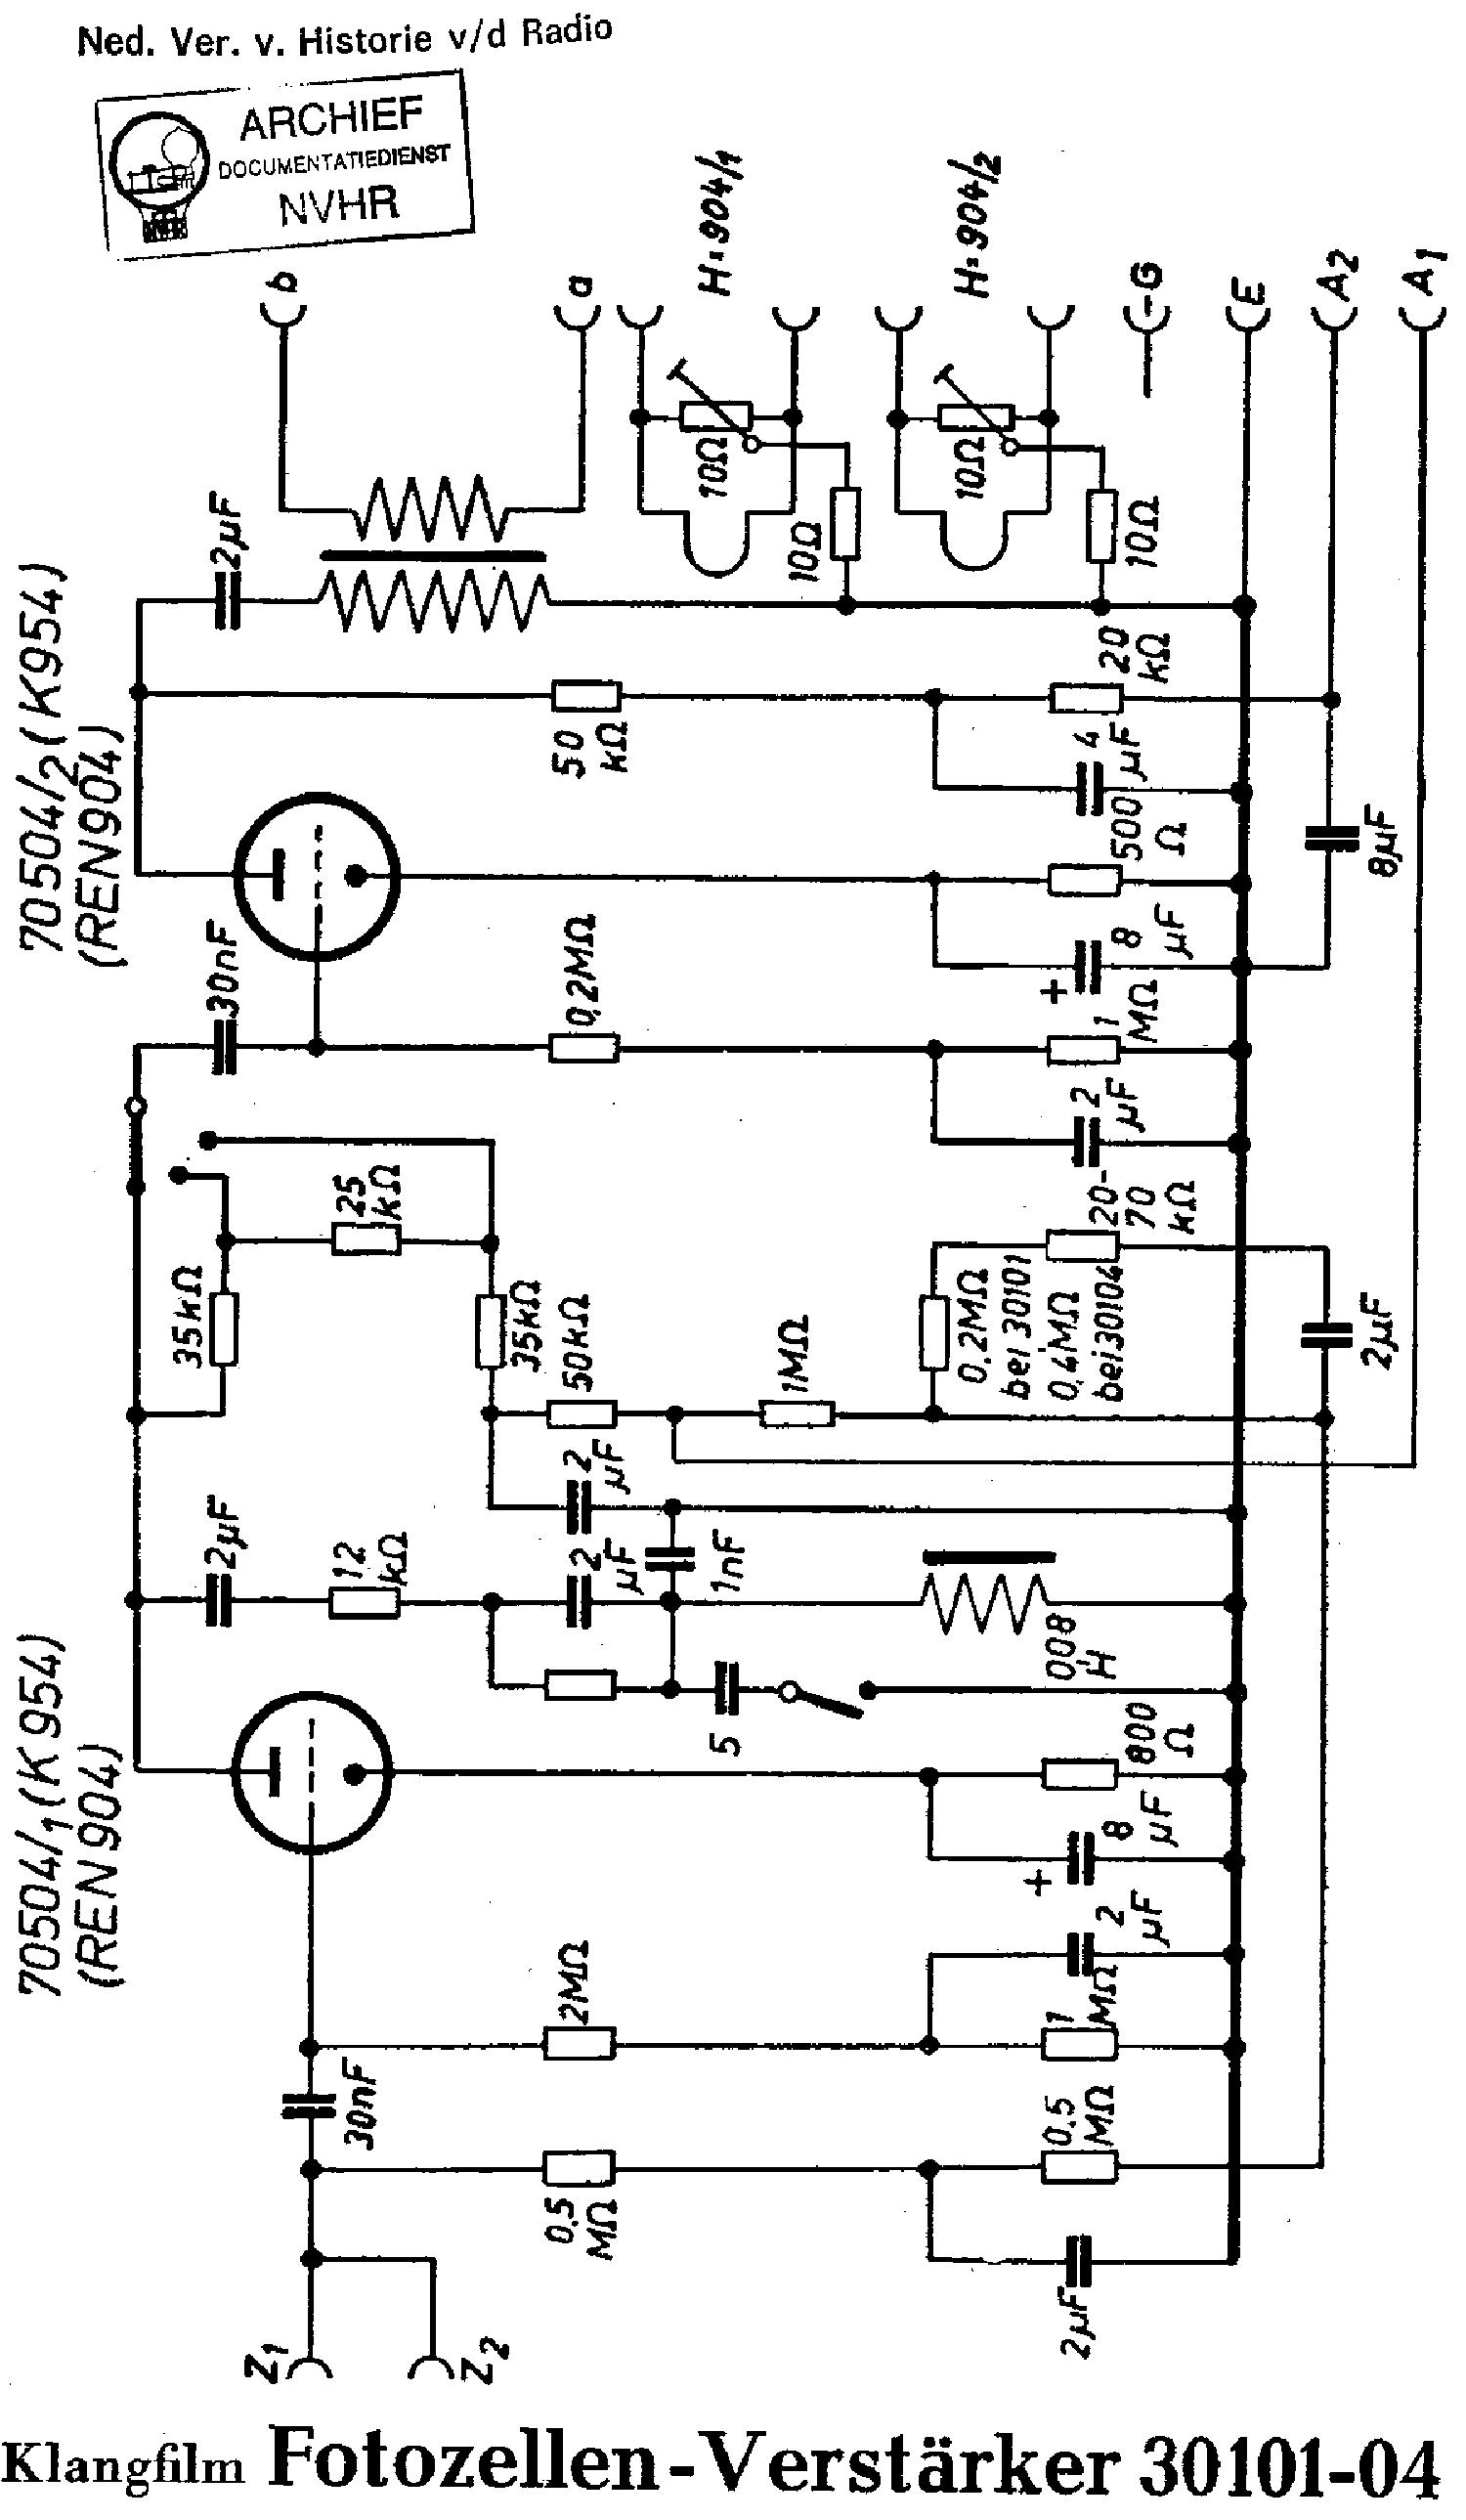 Klangfilm 34706 Europa Klarton Amplifier Sch Service Manual Download Photocells Amplifiers Circuit Schematic Diagram 30101 04 Photocell